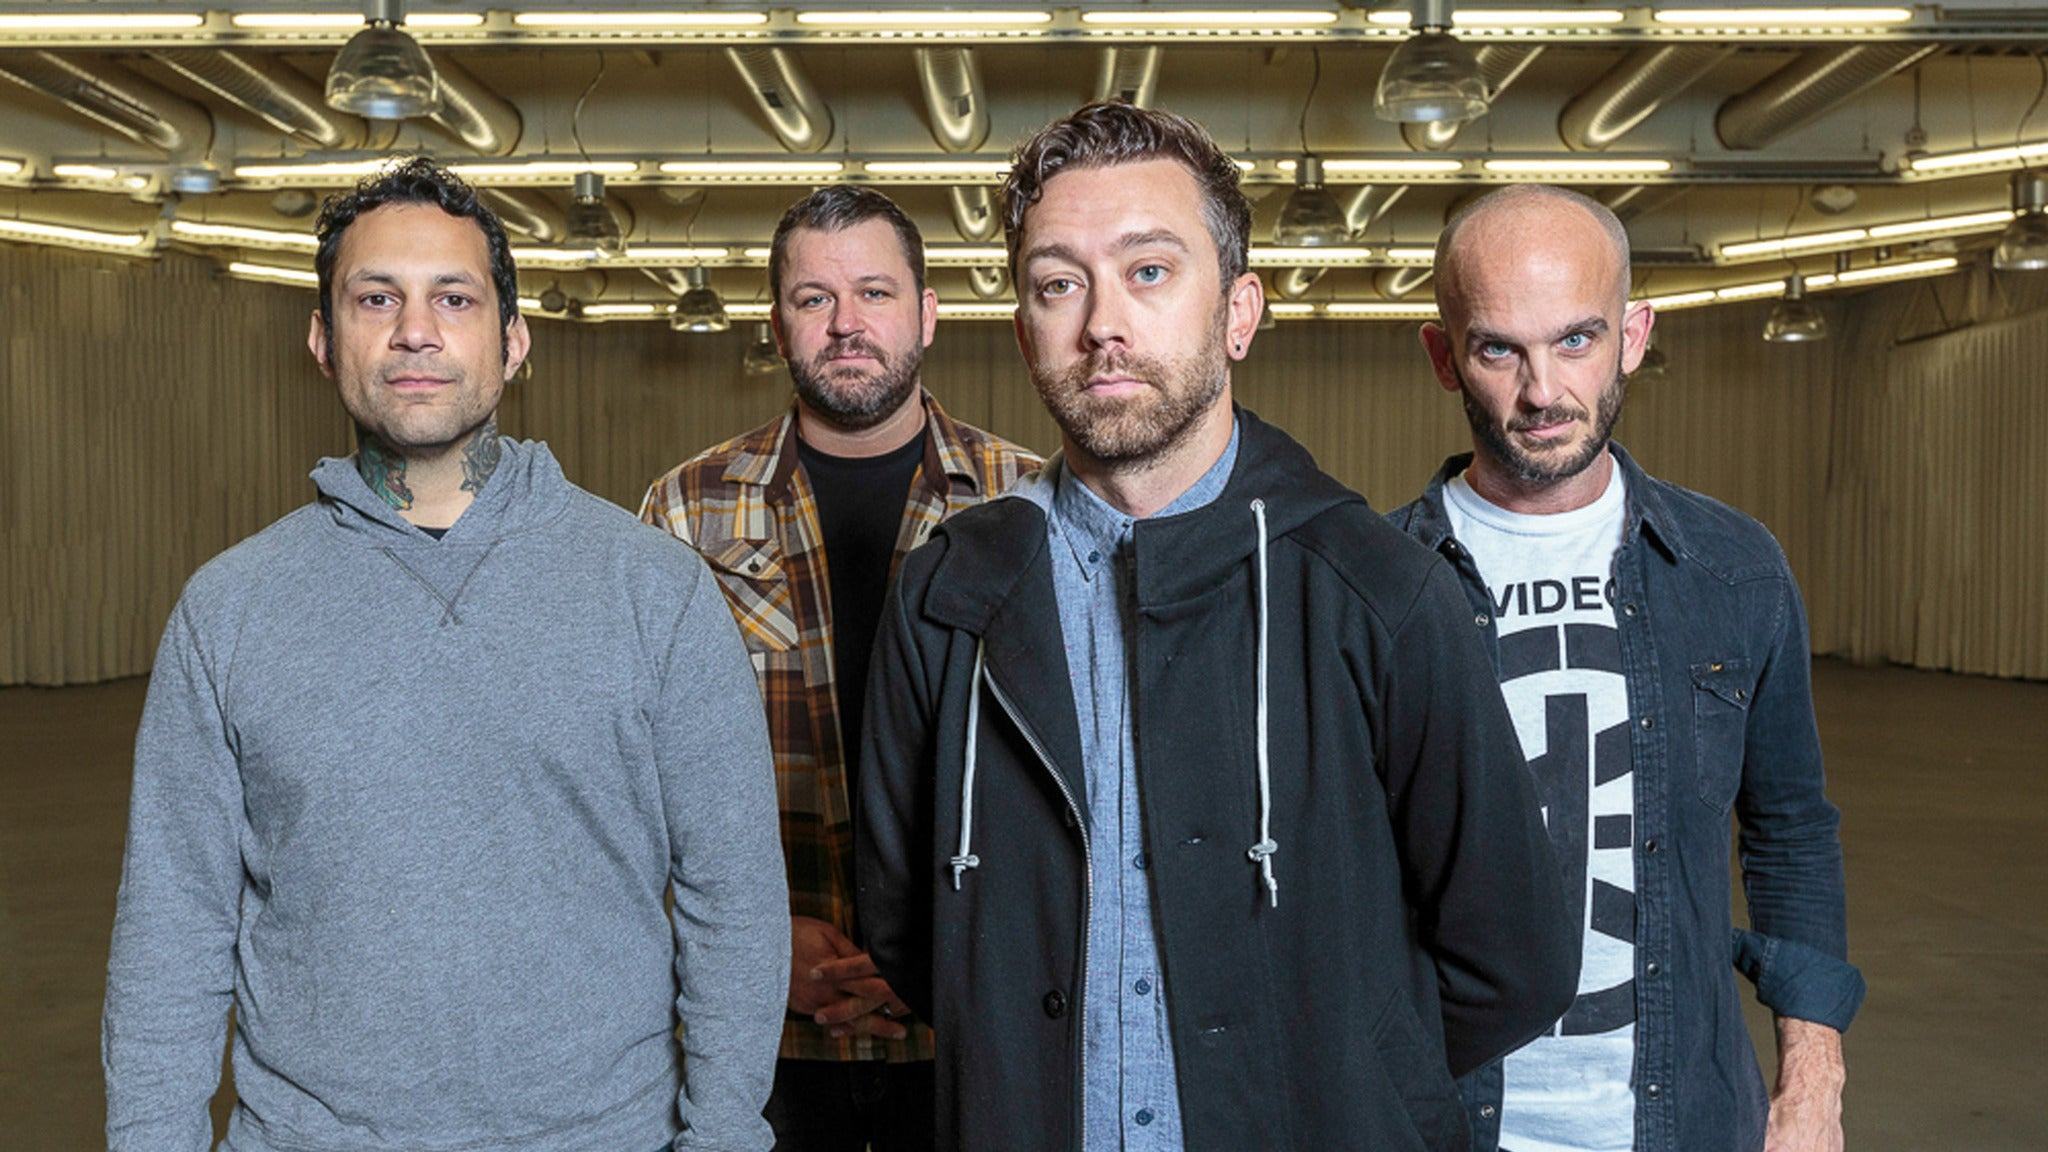 Rise Against & Deftones at Blue Hills Bank Pavilion